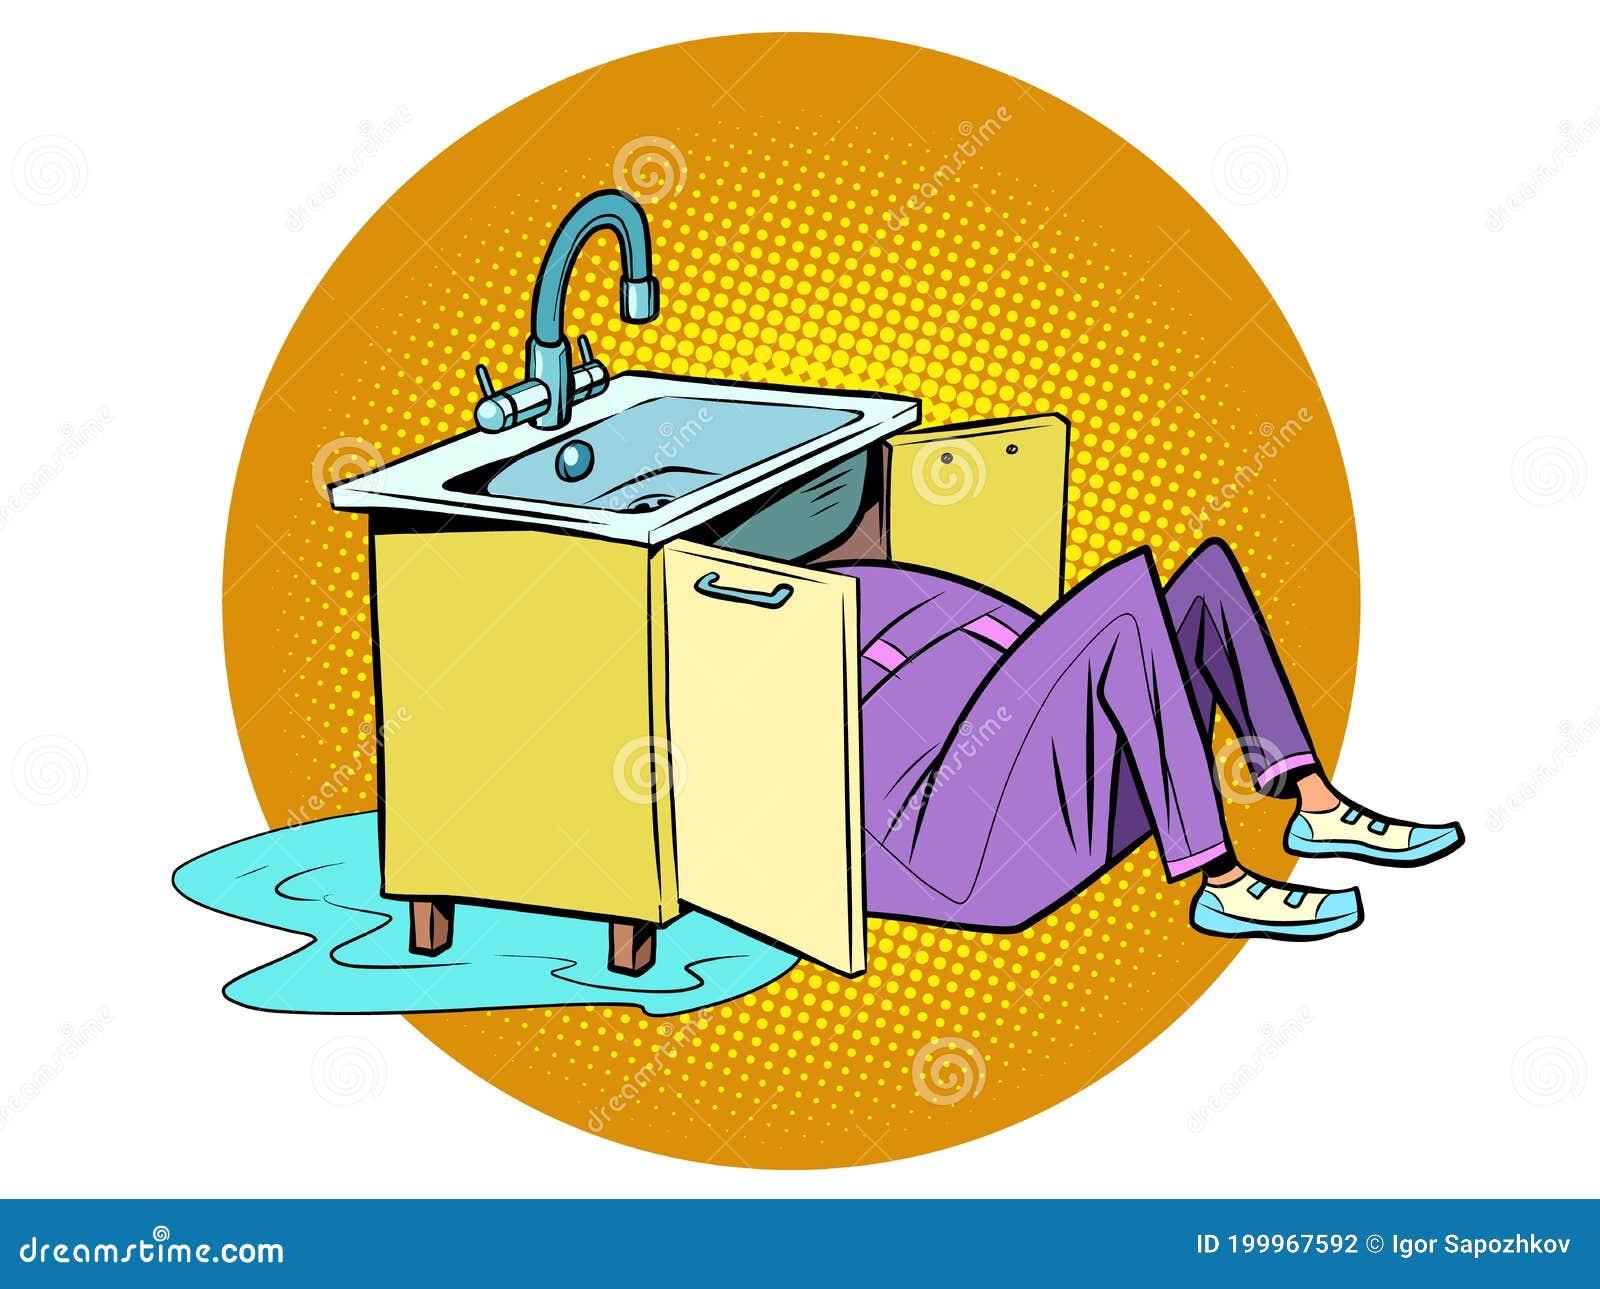 Plumber To Repair The Kitchen Sink Stock Vector Illustration Of Bathroom Contractor 199967592